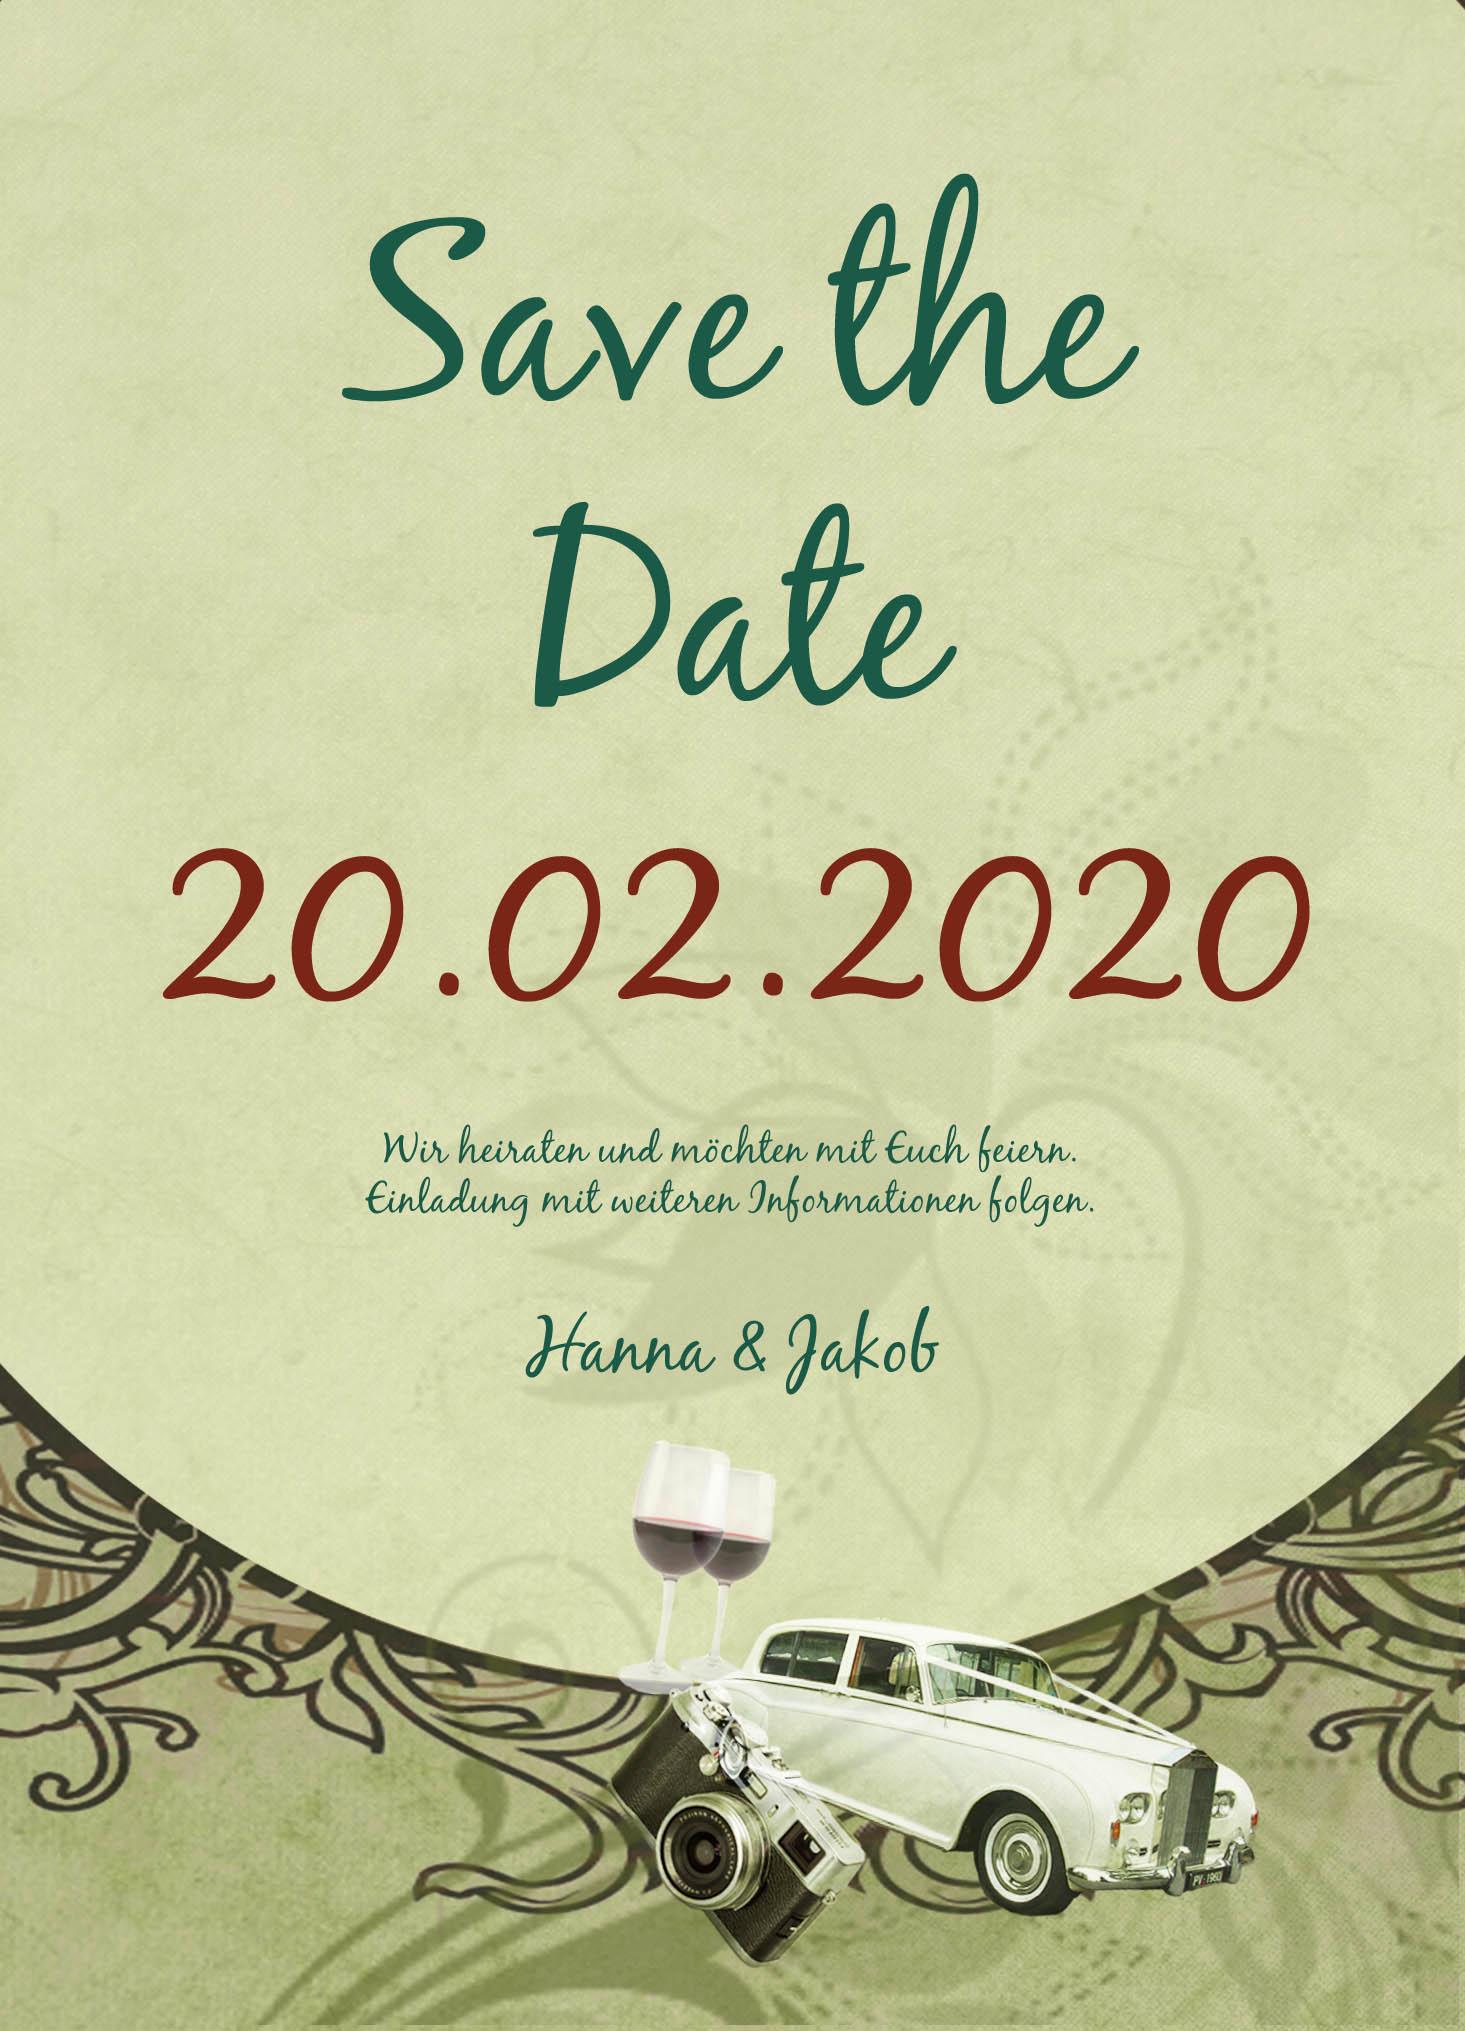 save-the-date-retro.jpg